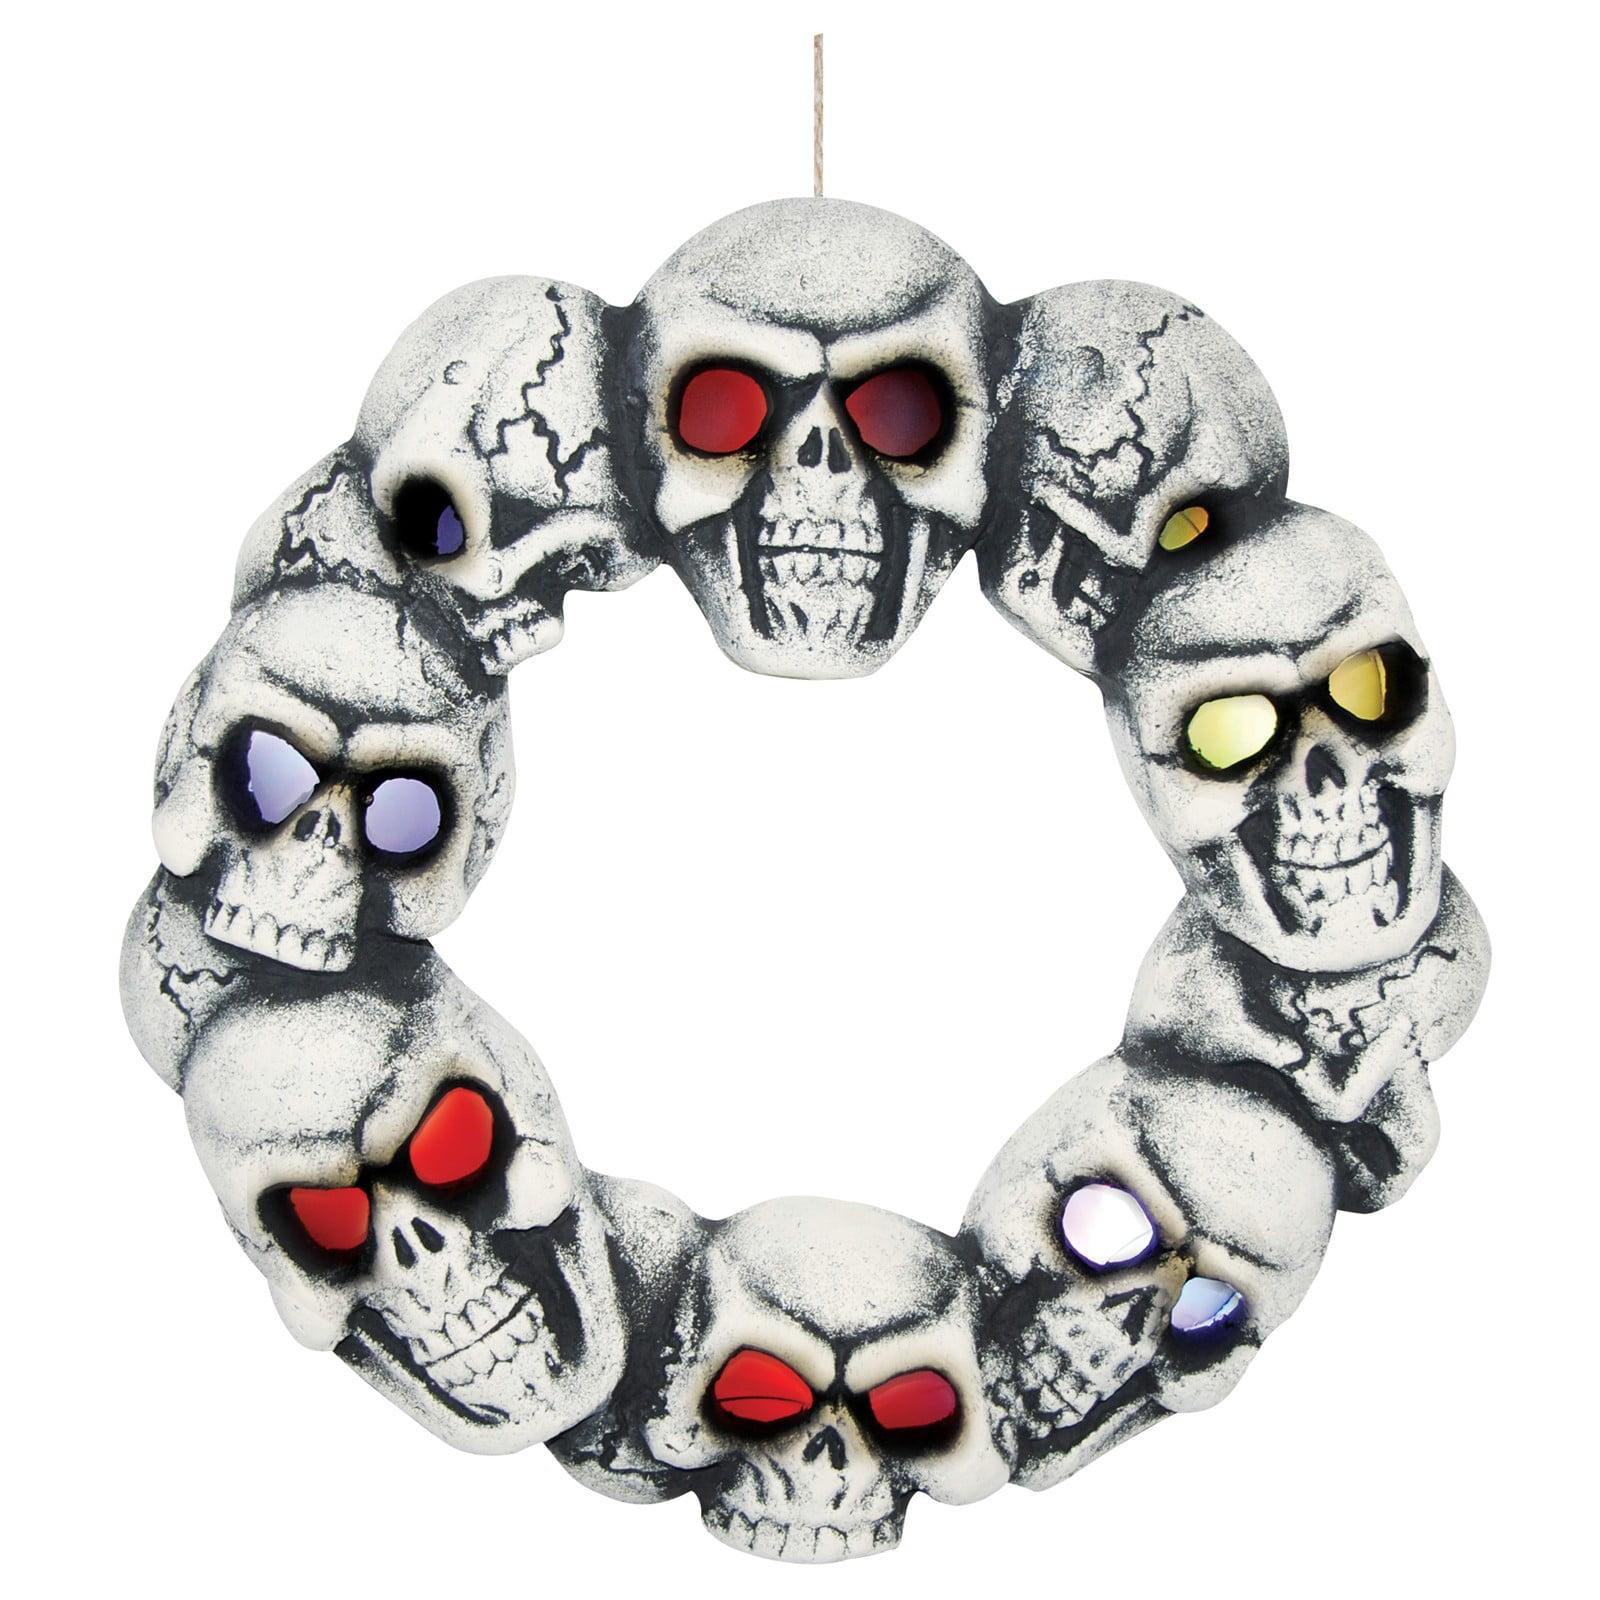 Skull Wreath with Lights